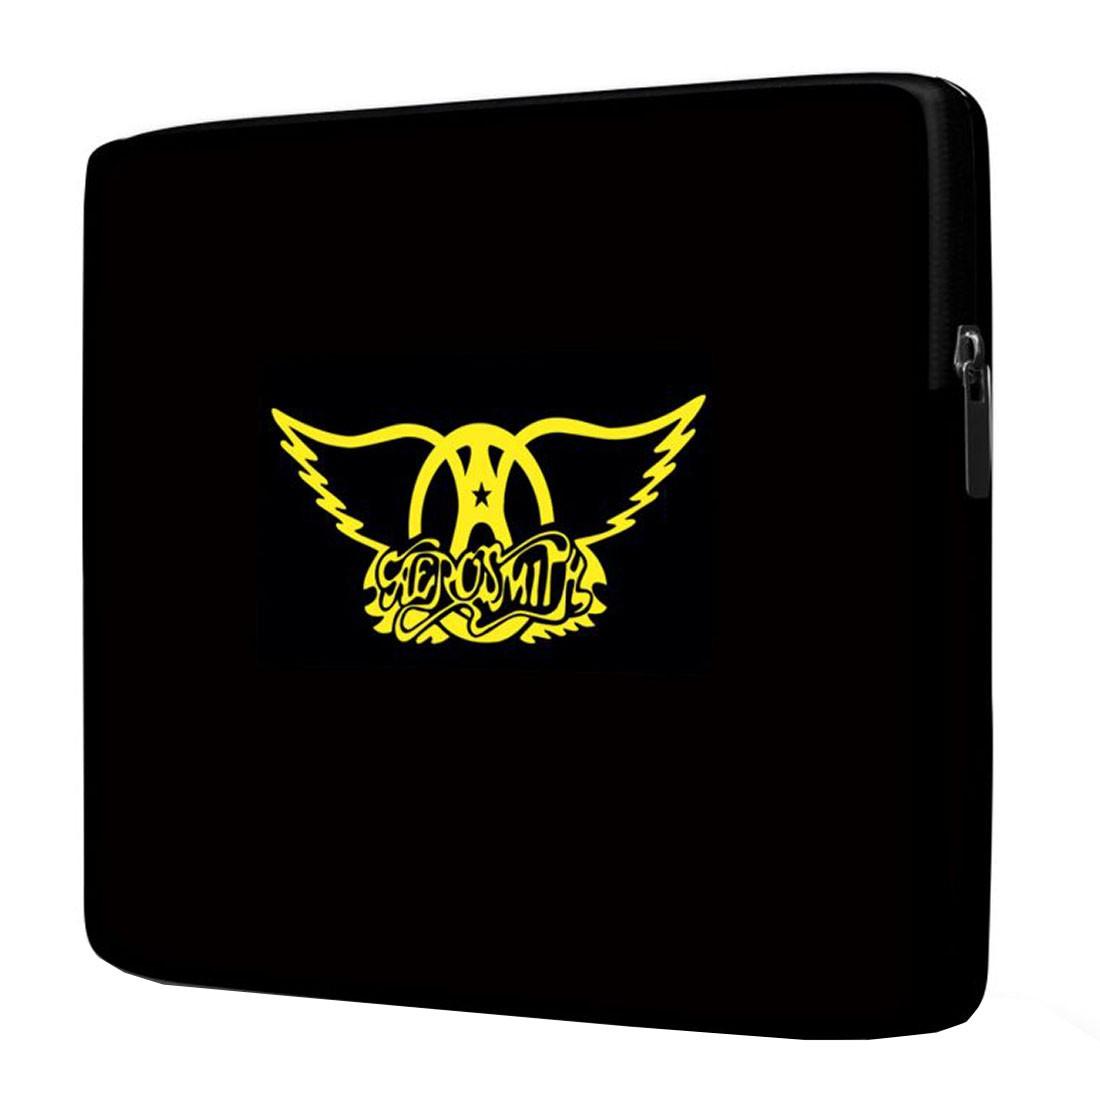 Capa para Notebook Aerosmith 15 Polegadas